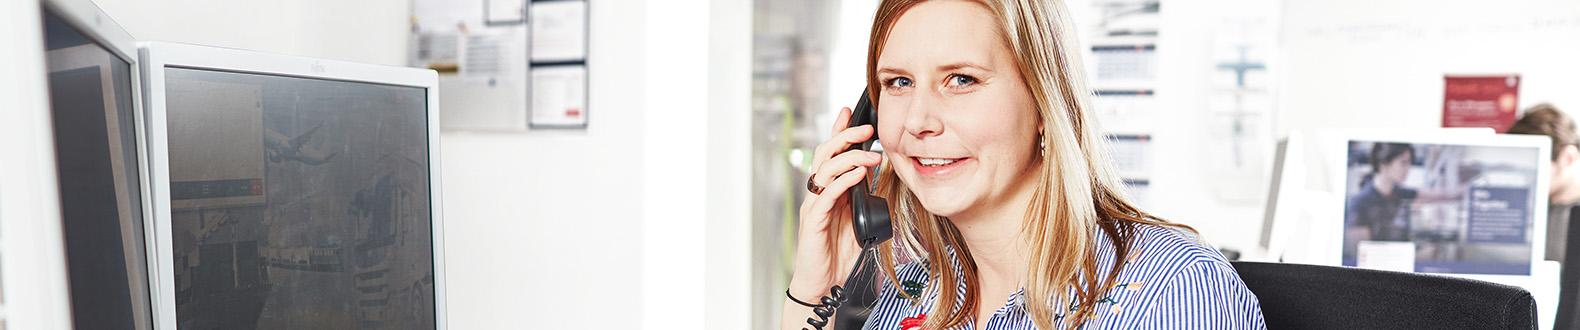 DB_Schenker_M40__Professional-White-Collar-Female_DeskPhone-data